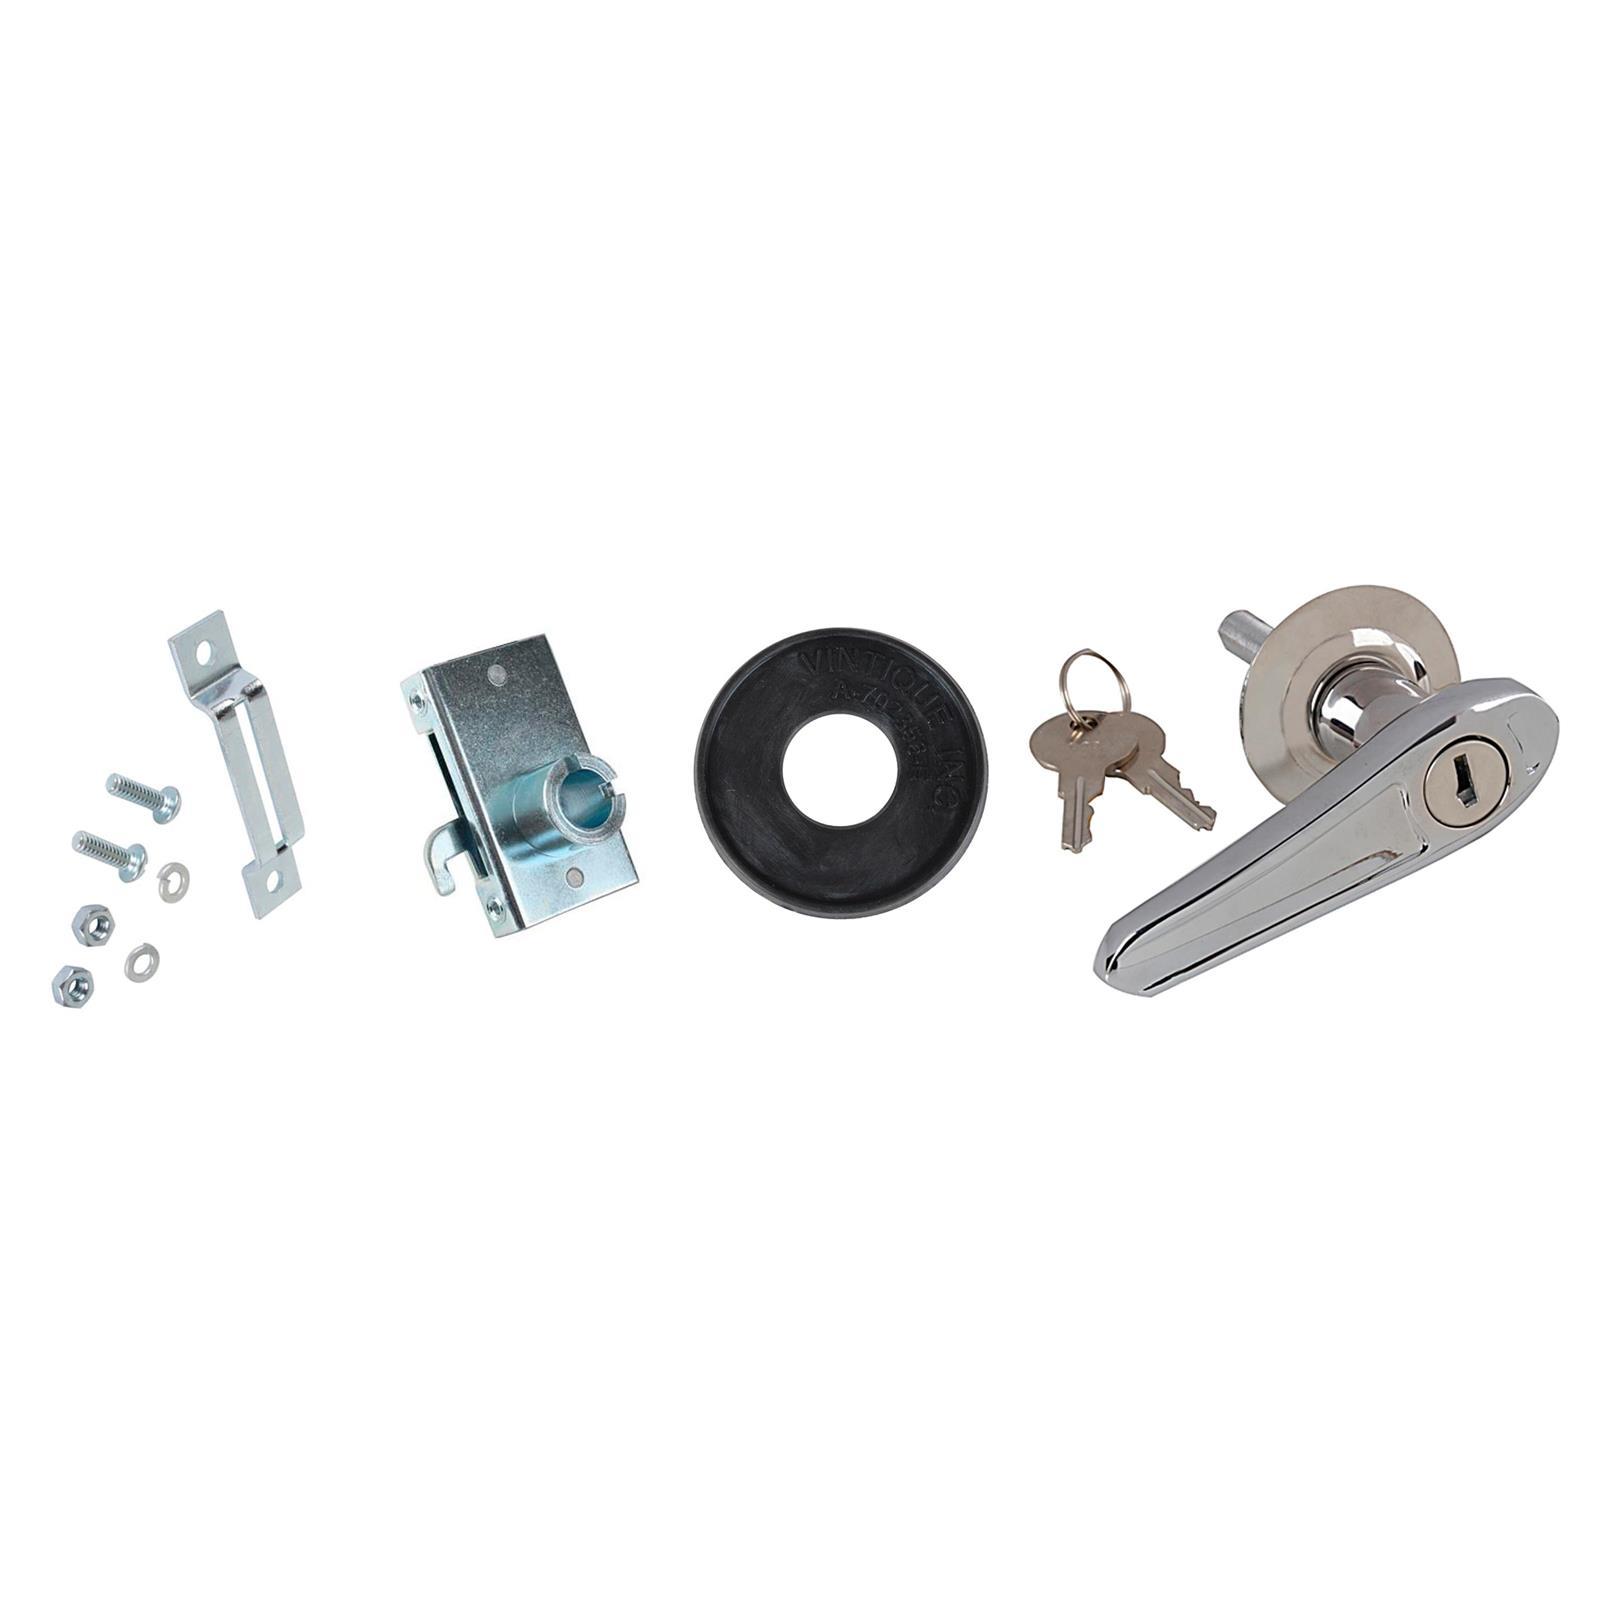 Hardware kits trunk Hardware Fittings